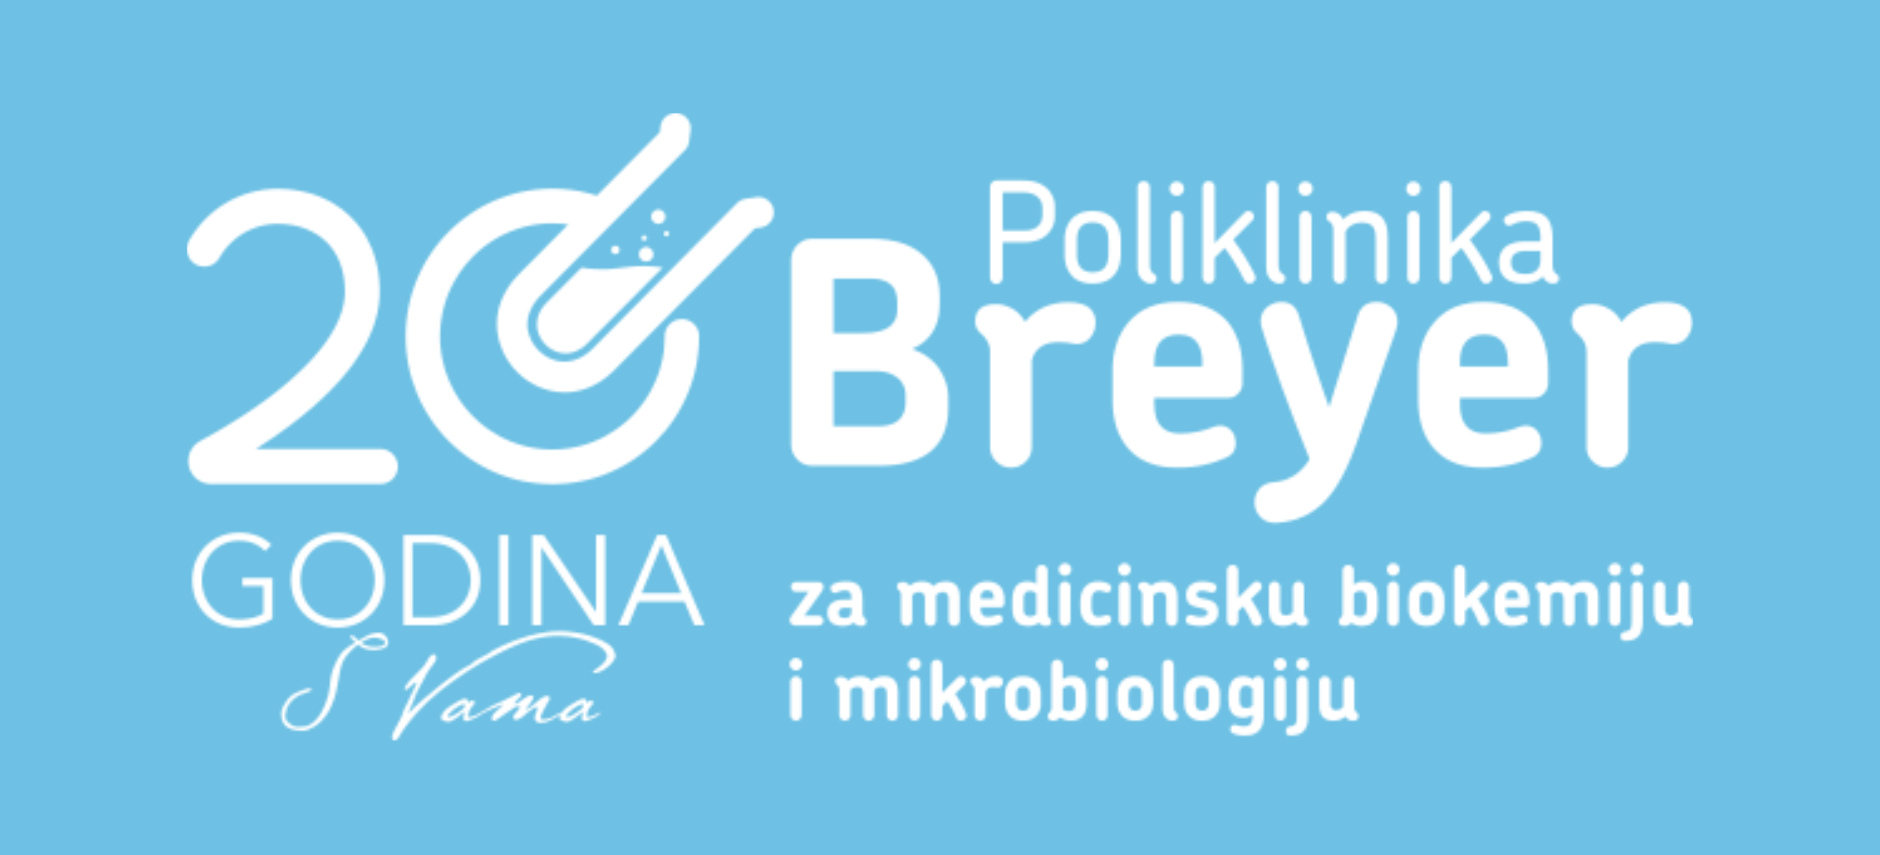 Suradnja s Poliklinikom Breyer